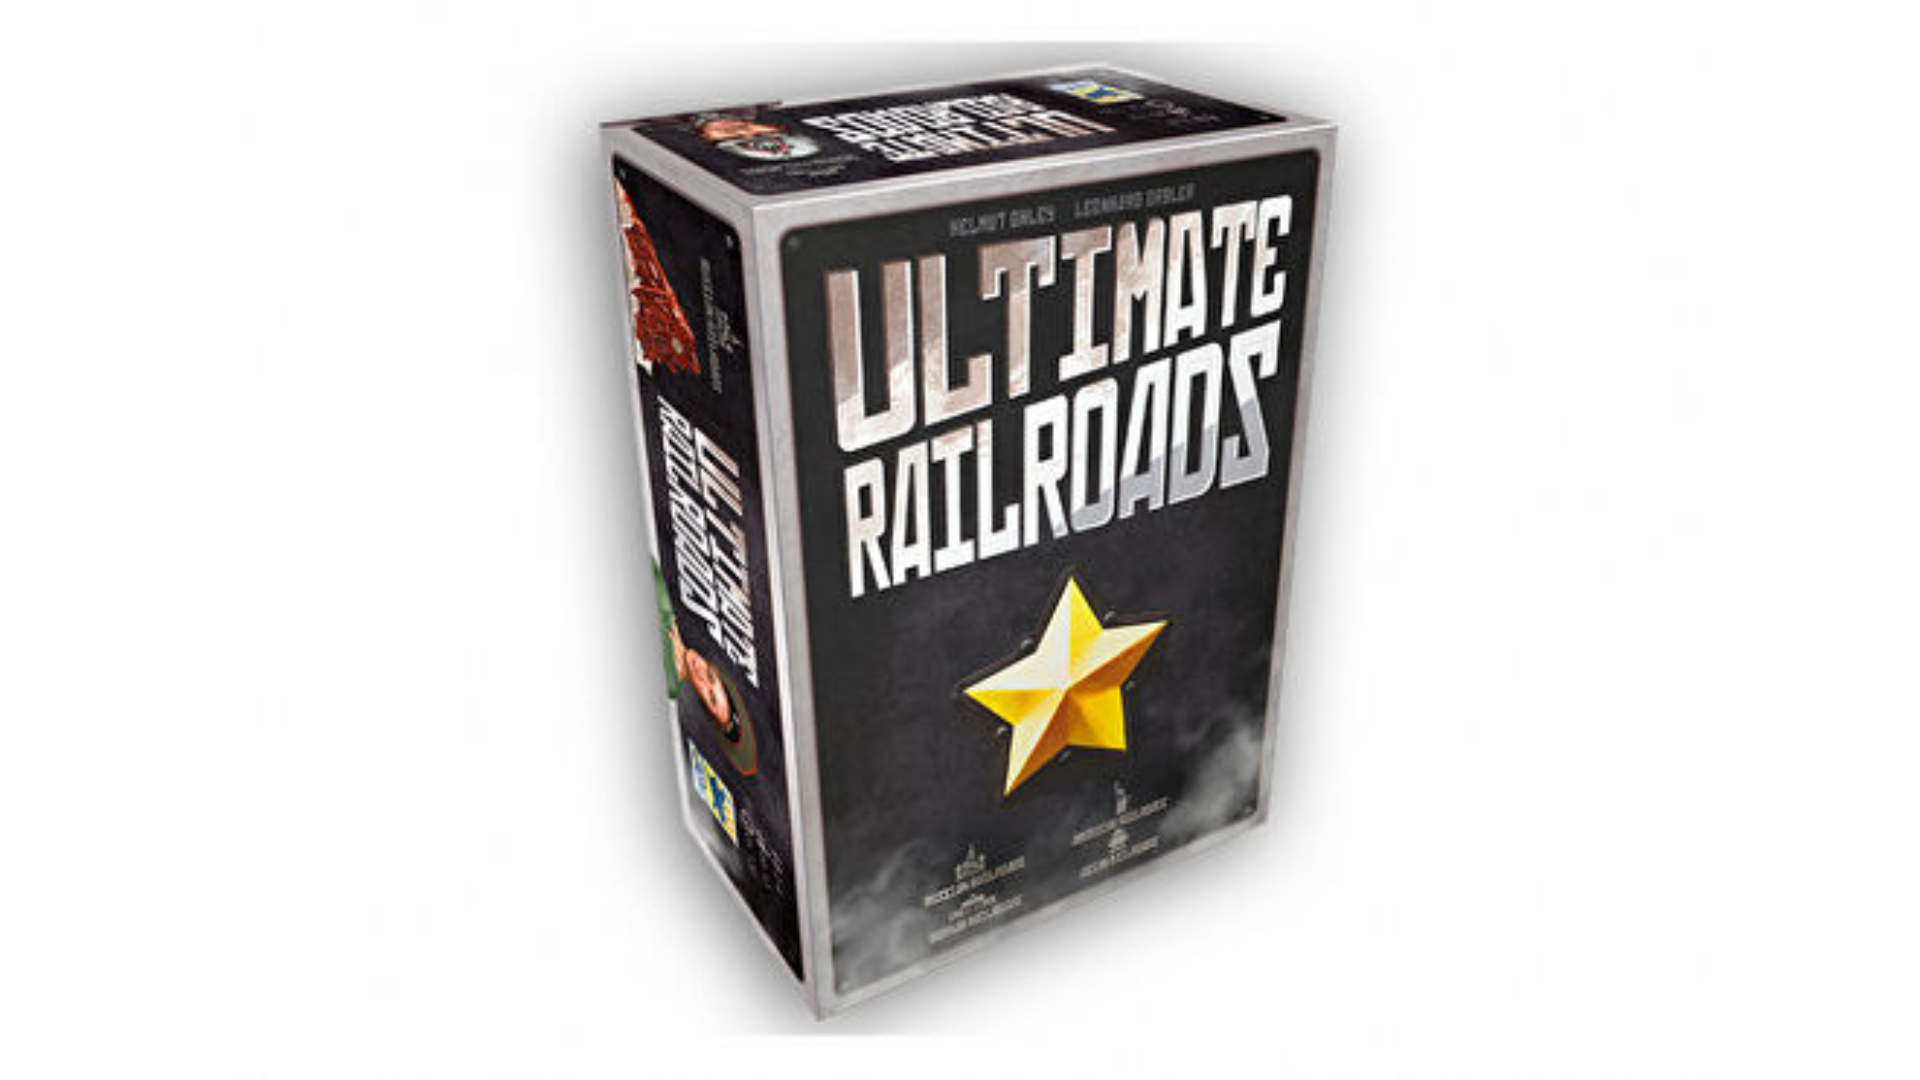 Ultimate Railroads box